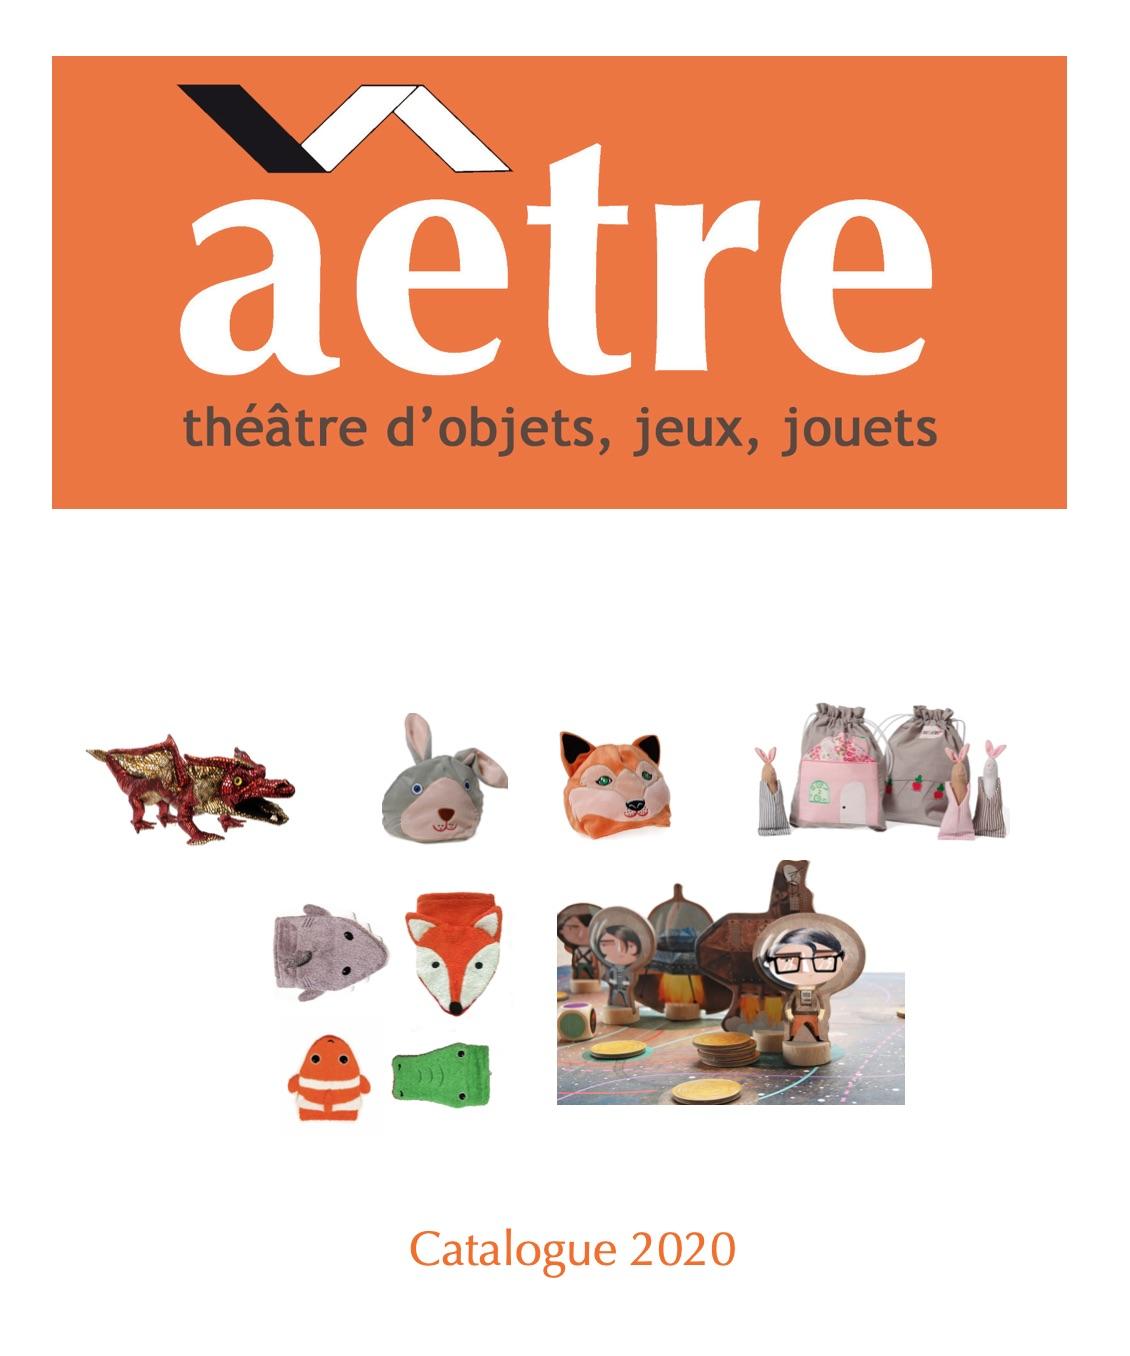 Catalogue Aetre 2020